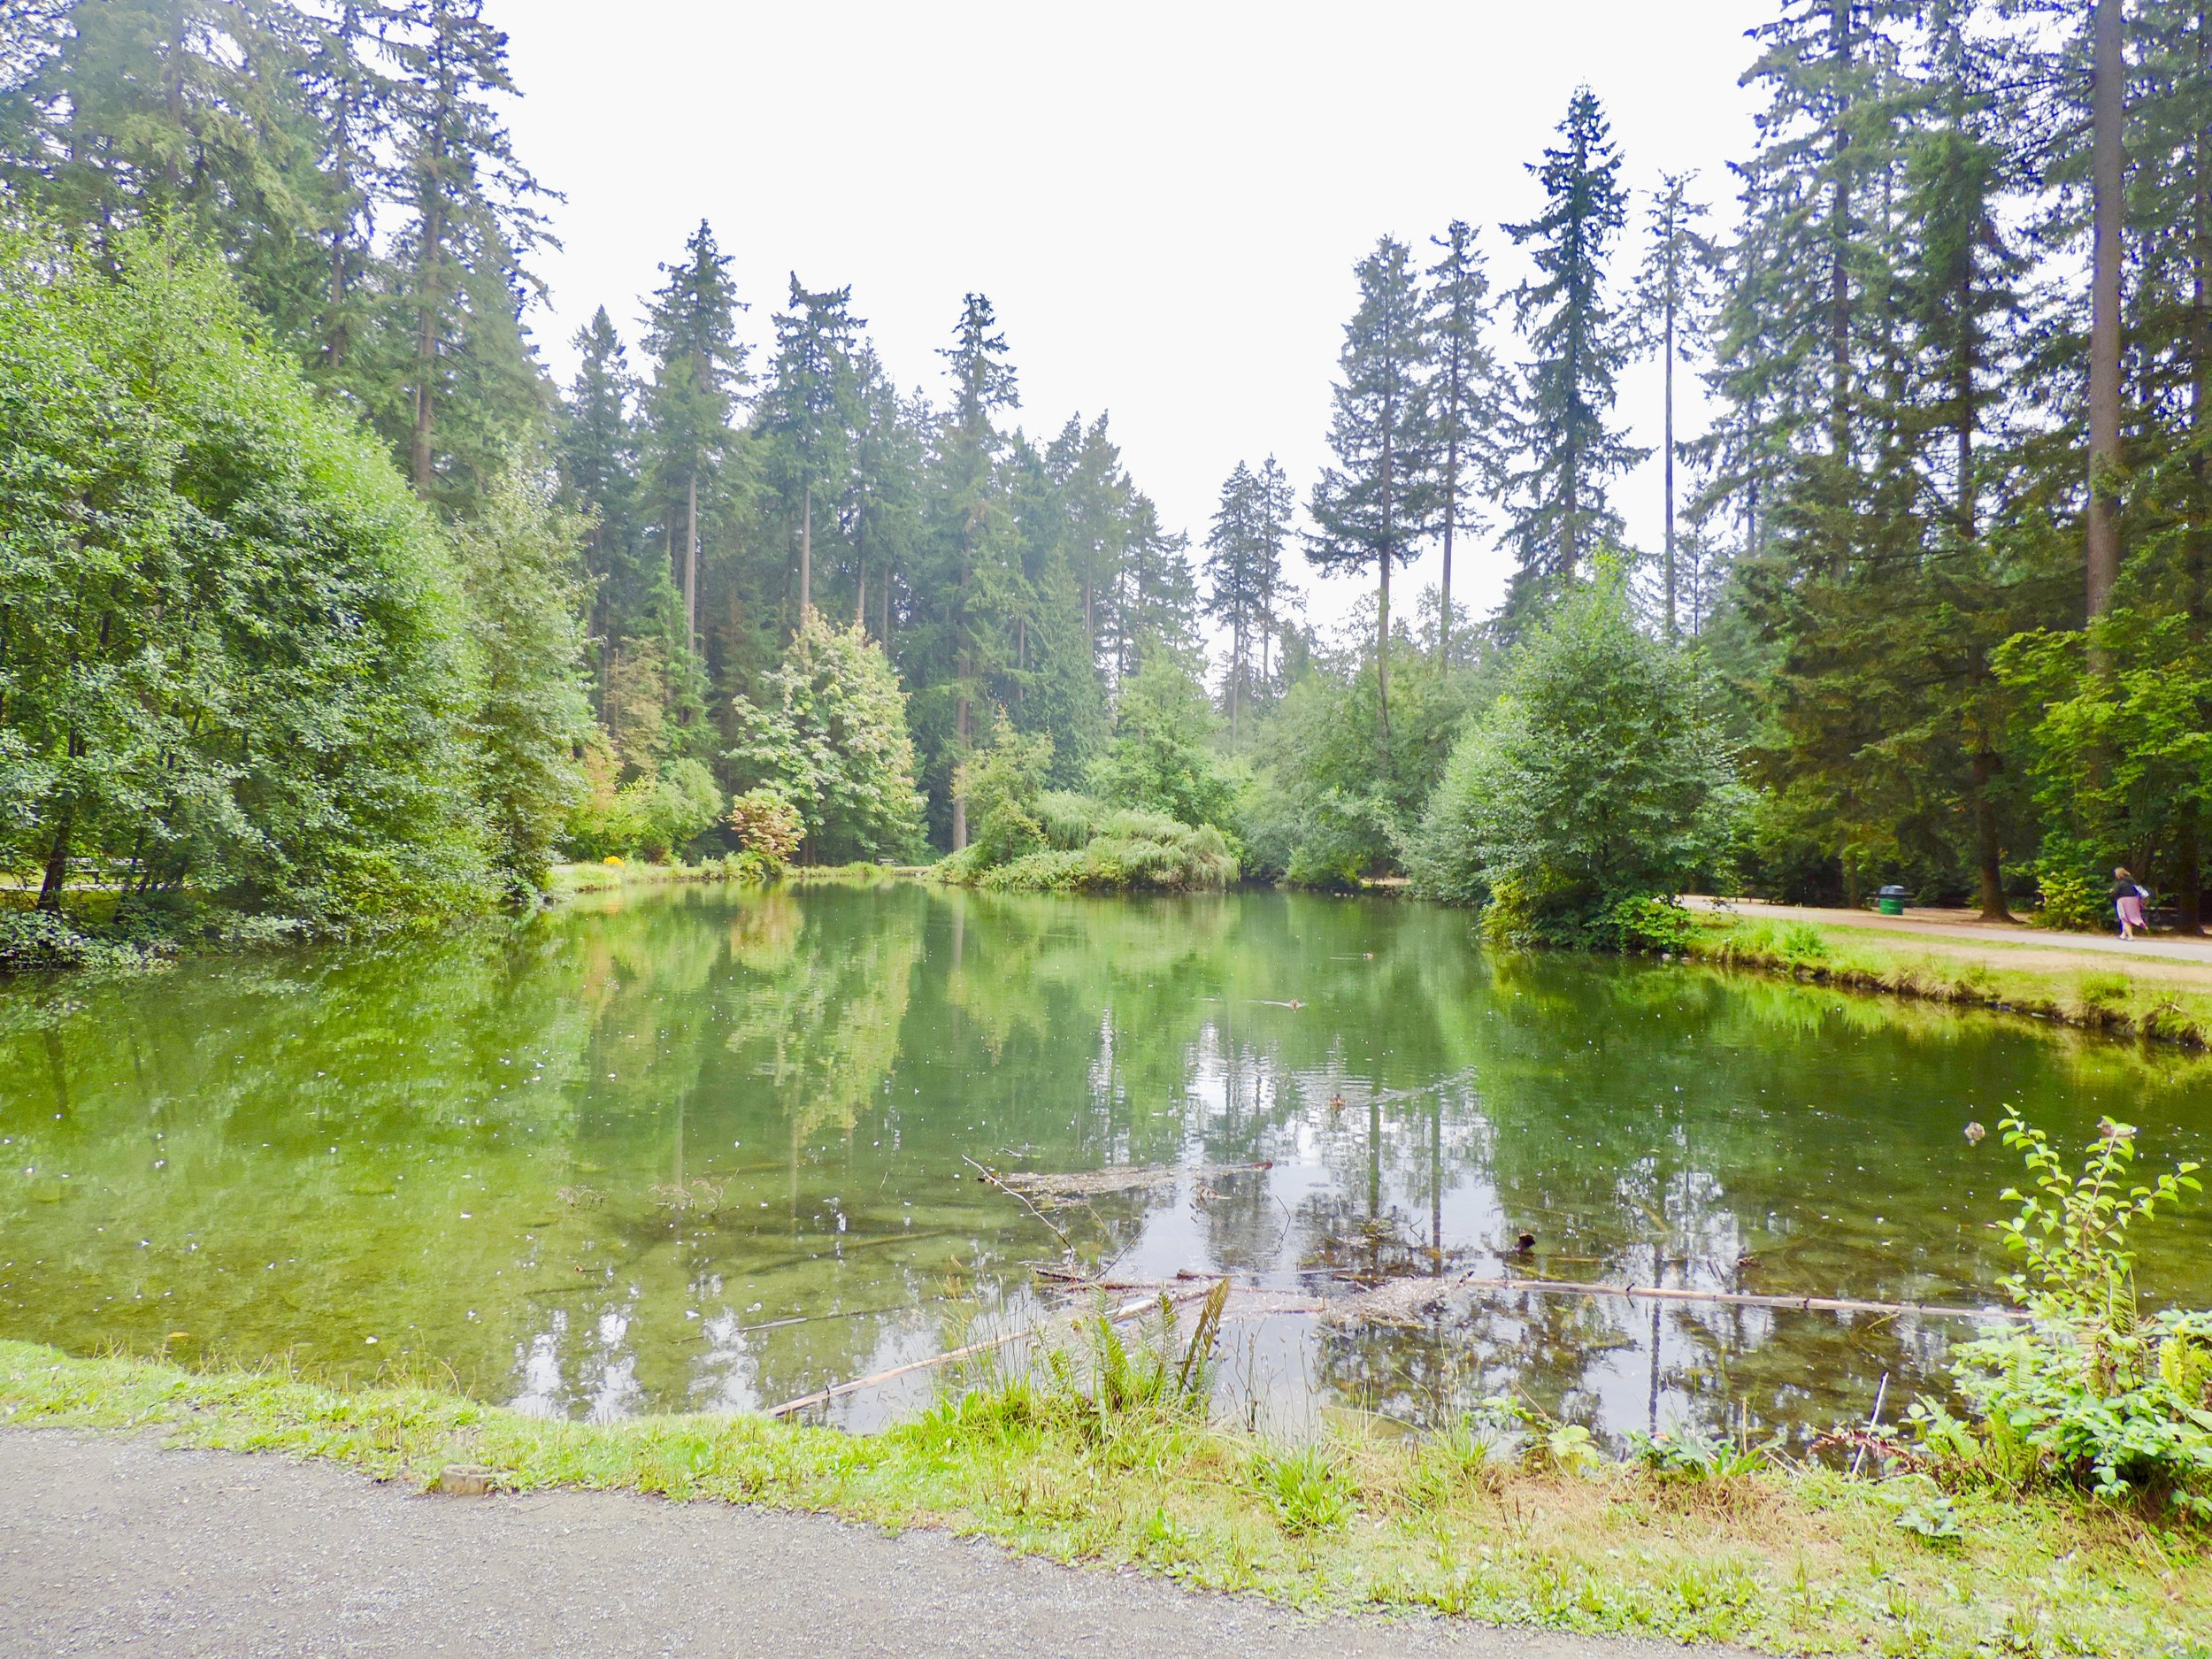 Upper Pond was definitely tranquil